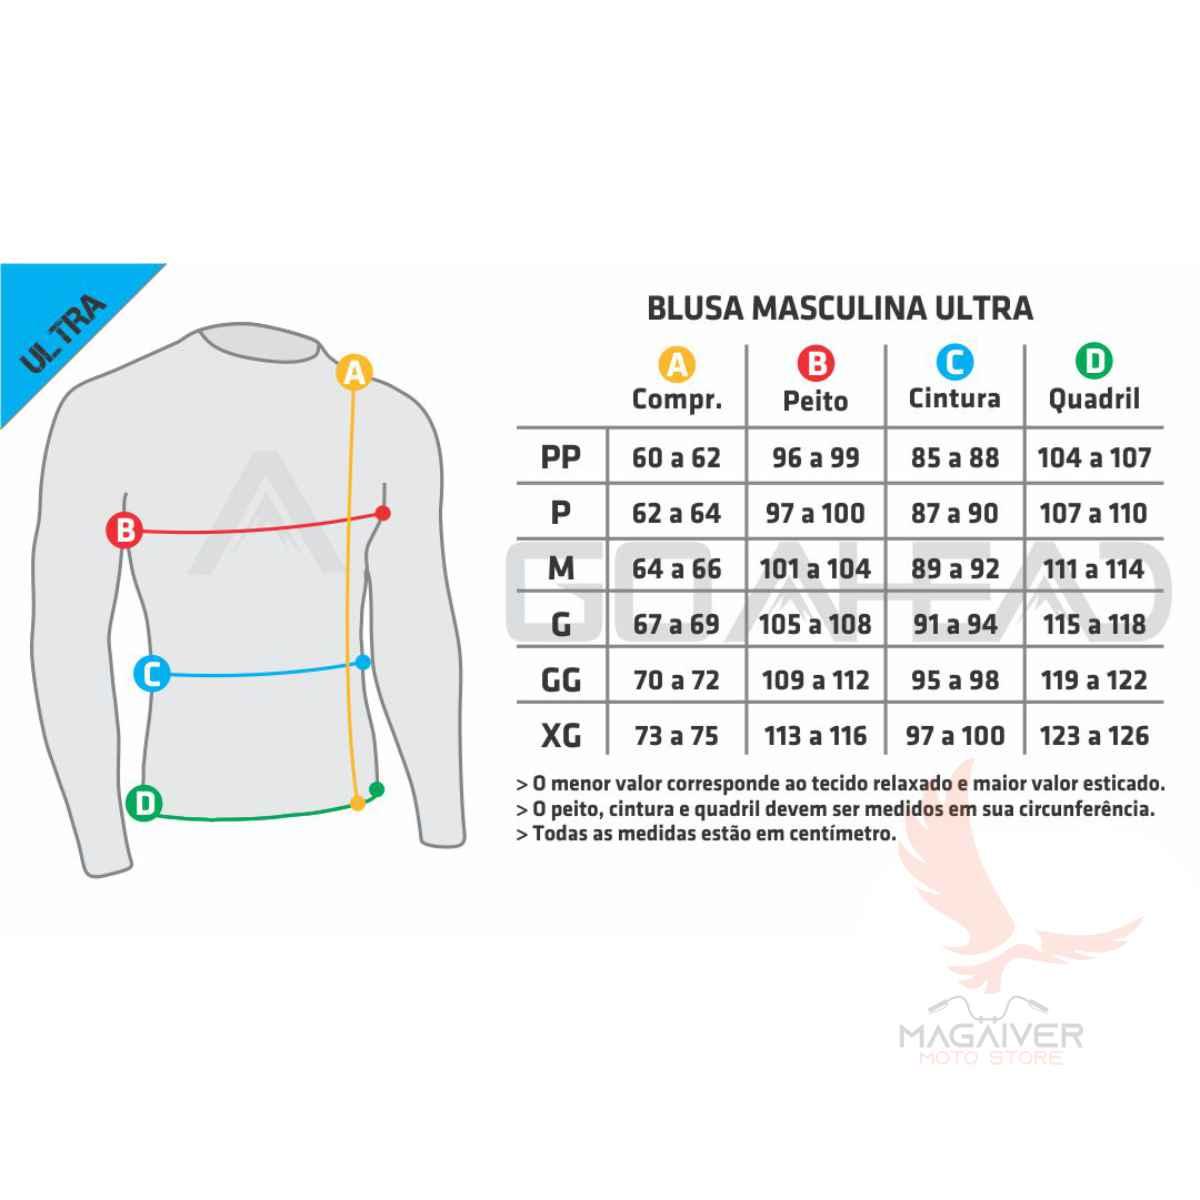 BLUSA GO AHEAD MASCULINO SEGUNDA PELE C/ ZÍPER ULTRA ( FRIO - INVERNO )